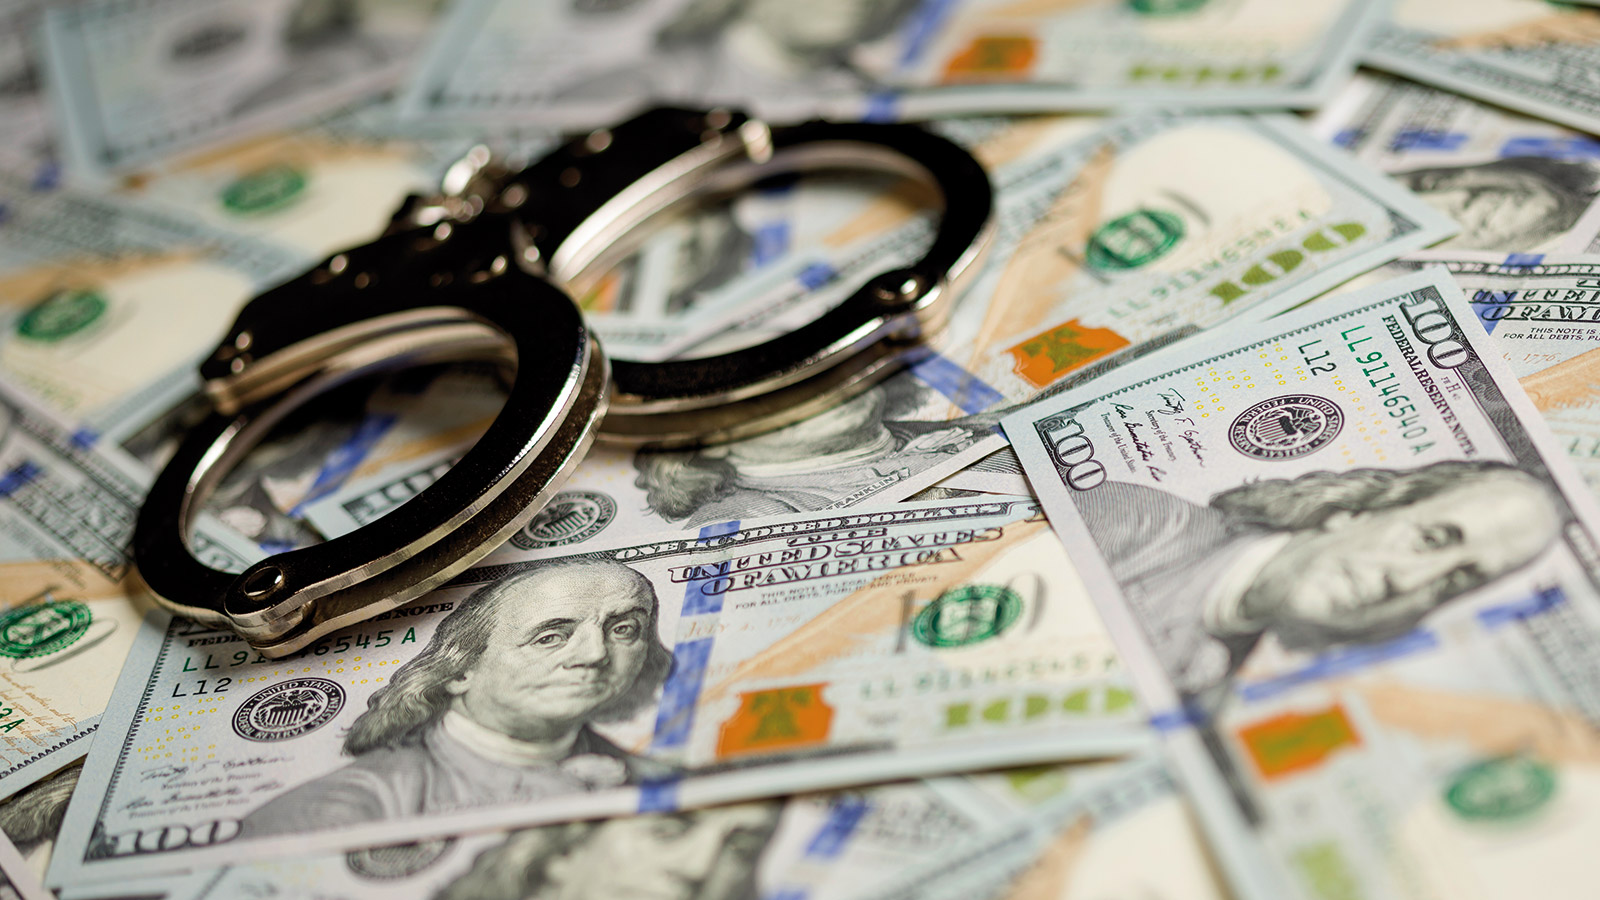 Argent-billets-Dollars-menottes-iSt29129744XXXL